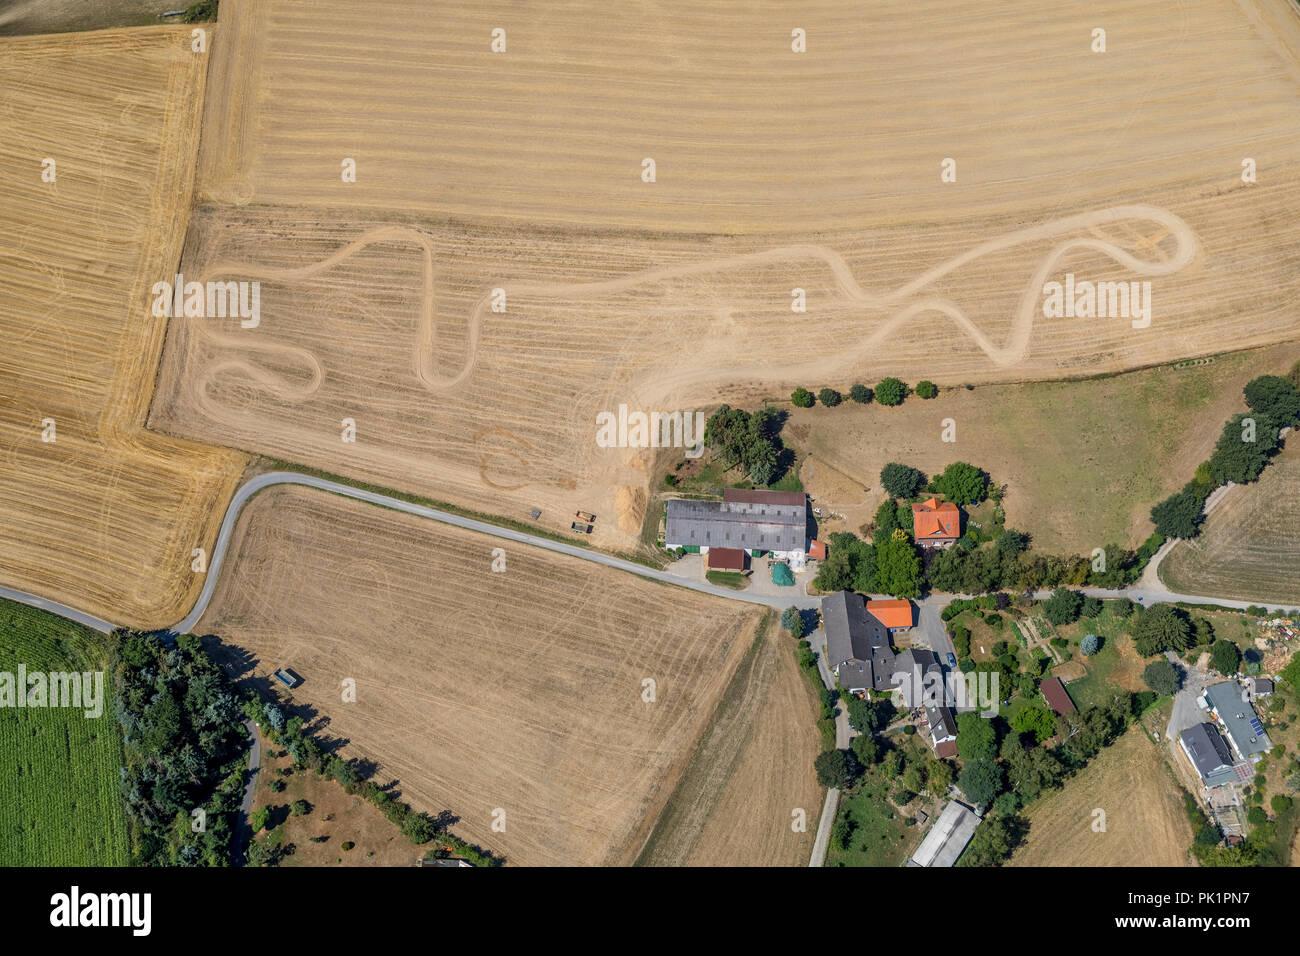 Motocross tracks on a field at Kleinhofweg in Heiligenhaus, drought, drought, hot summer, Heiligenhaus, Ruhr Area - Stock Image